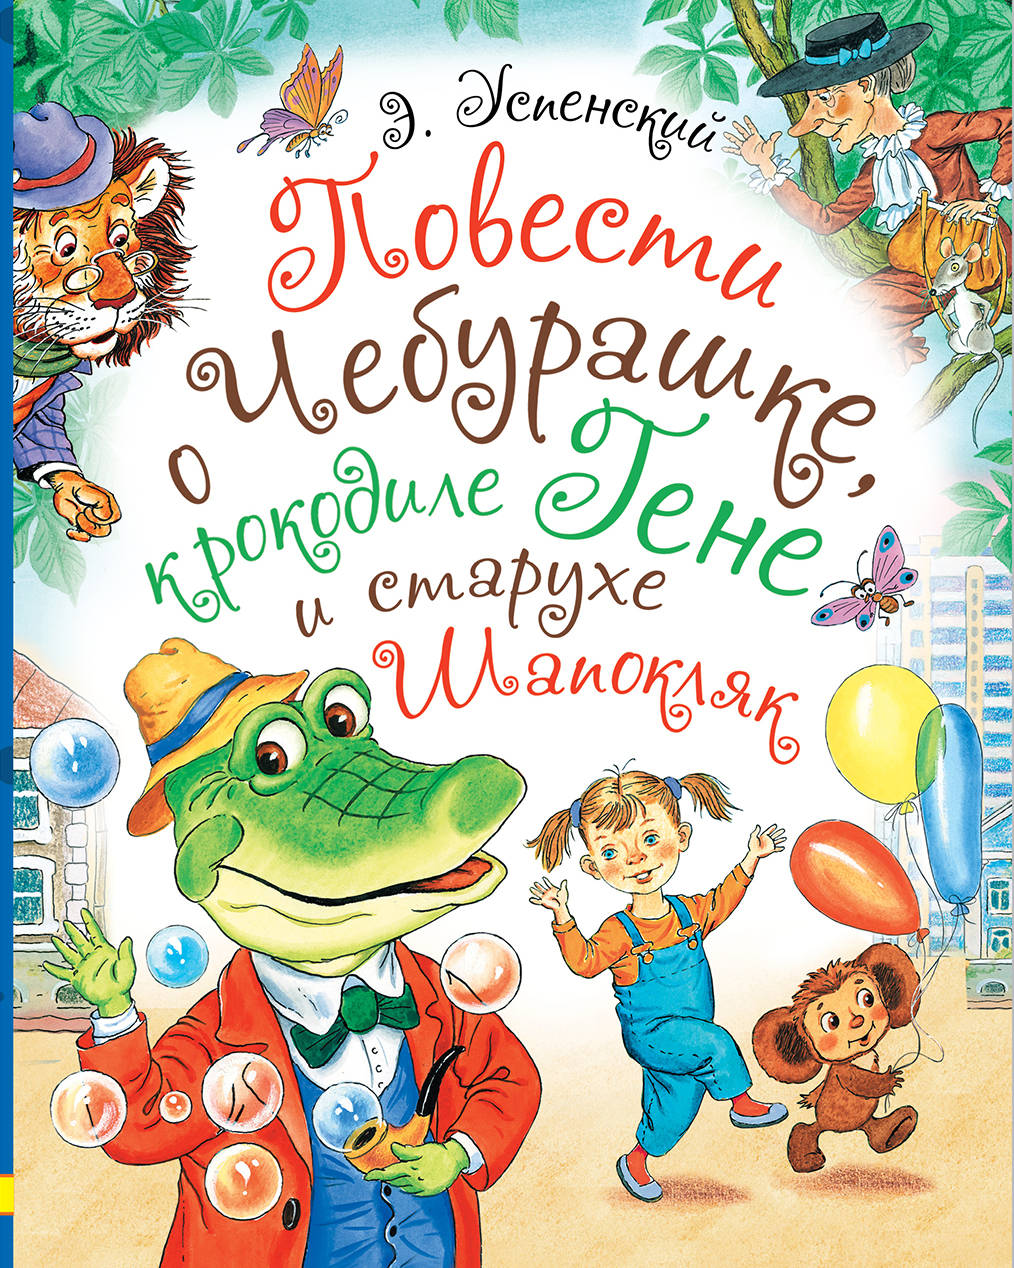 Повести о Чебурашке, крокодиле Гене и старухе Шапокляк, Успенский Эдуард Николаевич